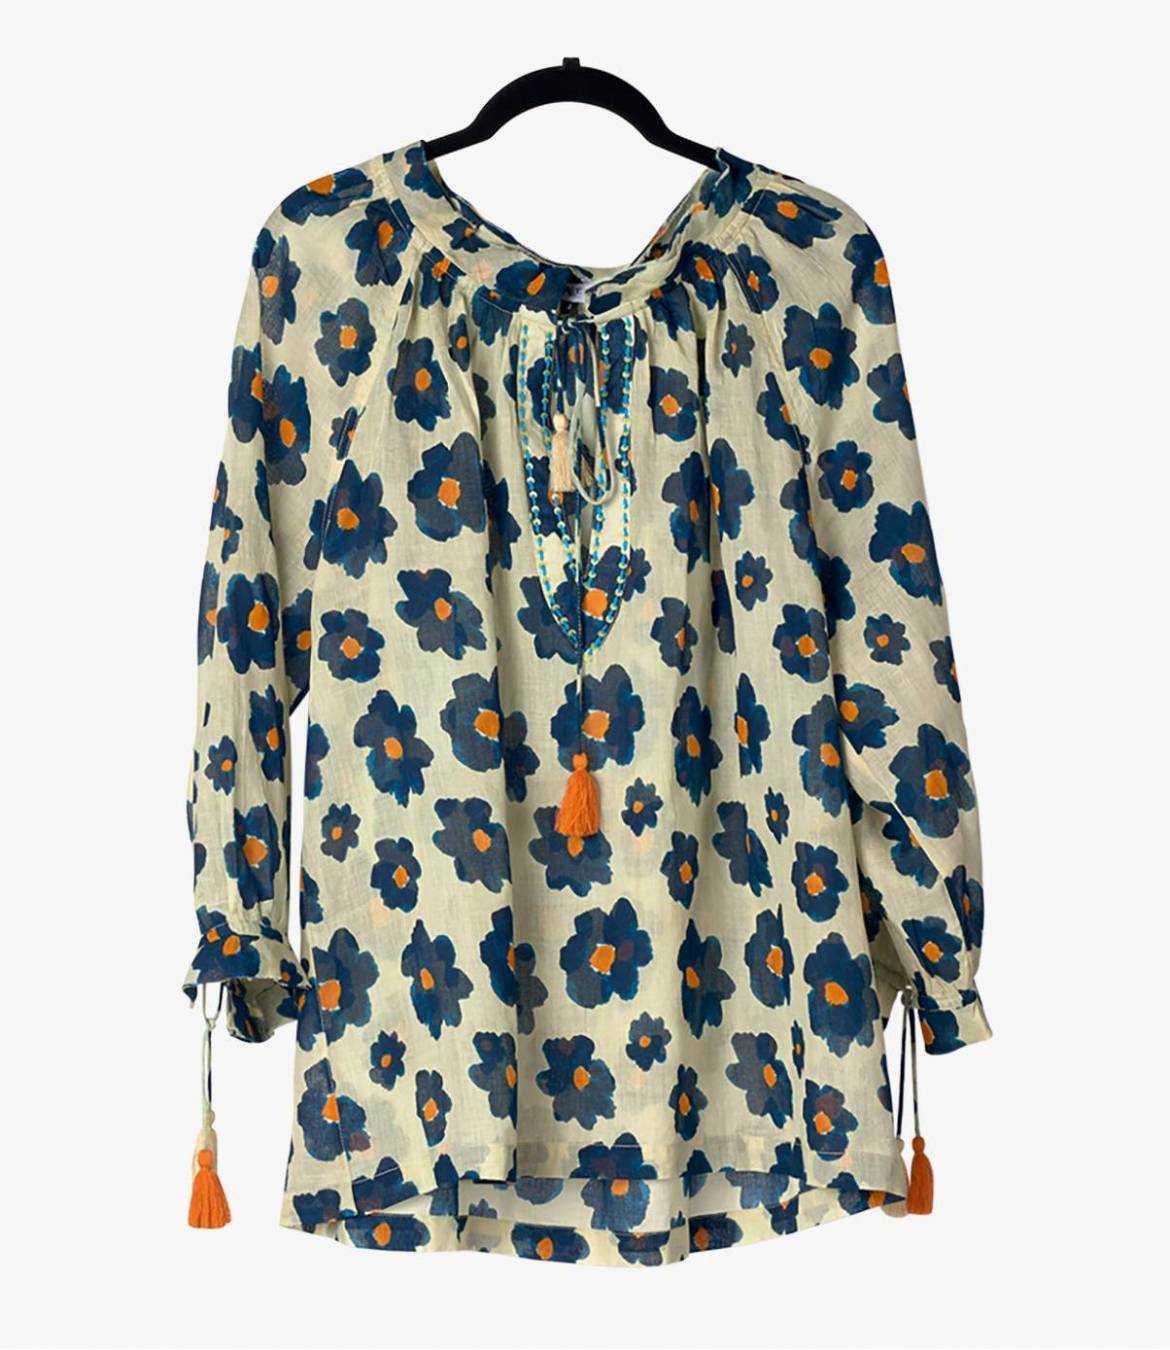 BETI ASTER Cotton Blouse for Women Storiatipic - 1